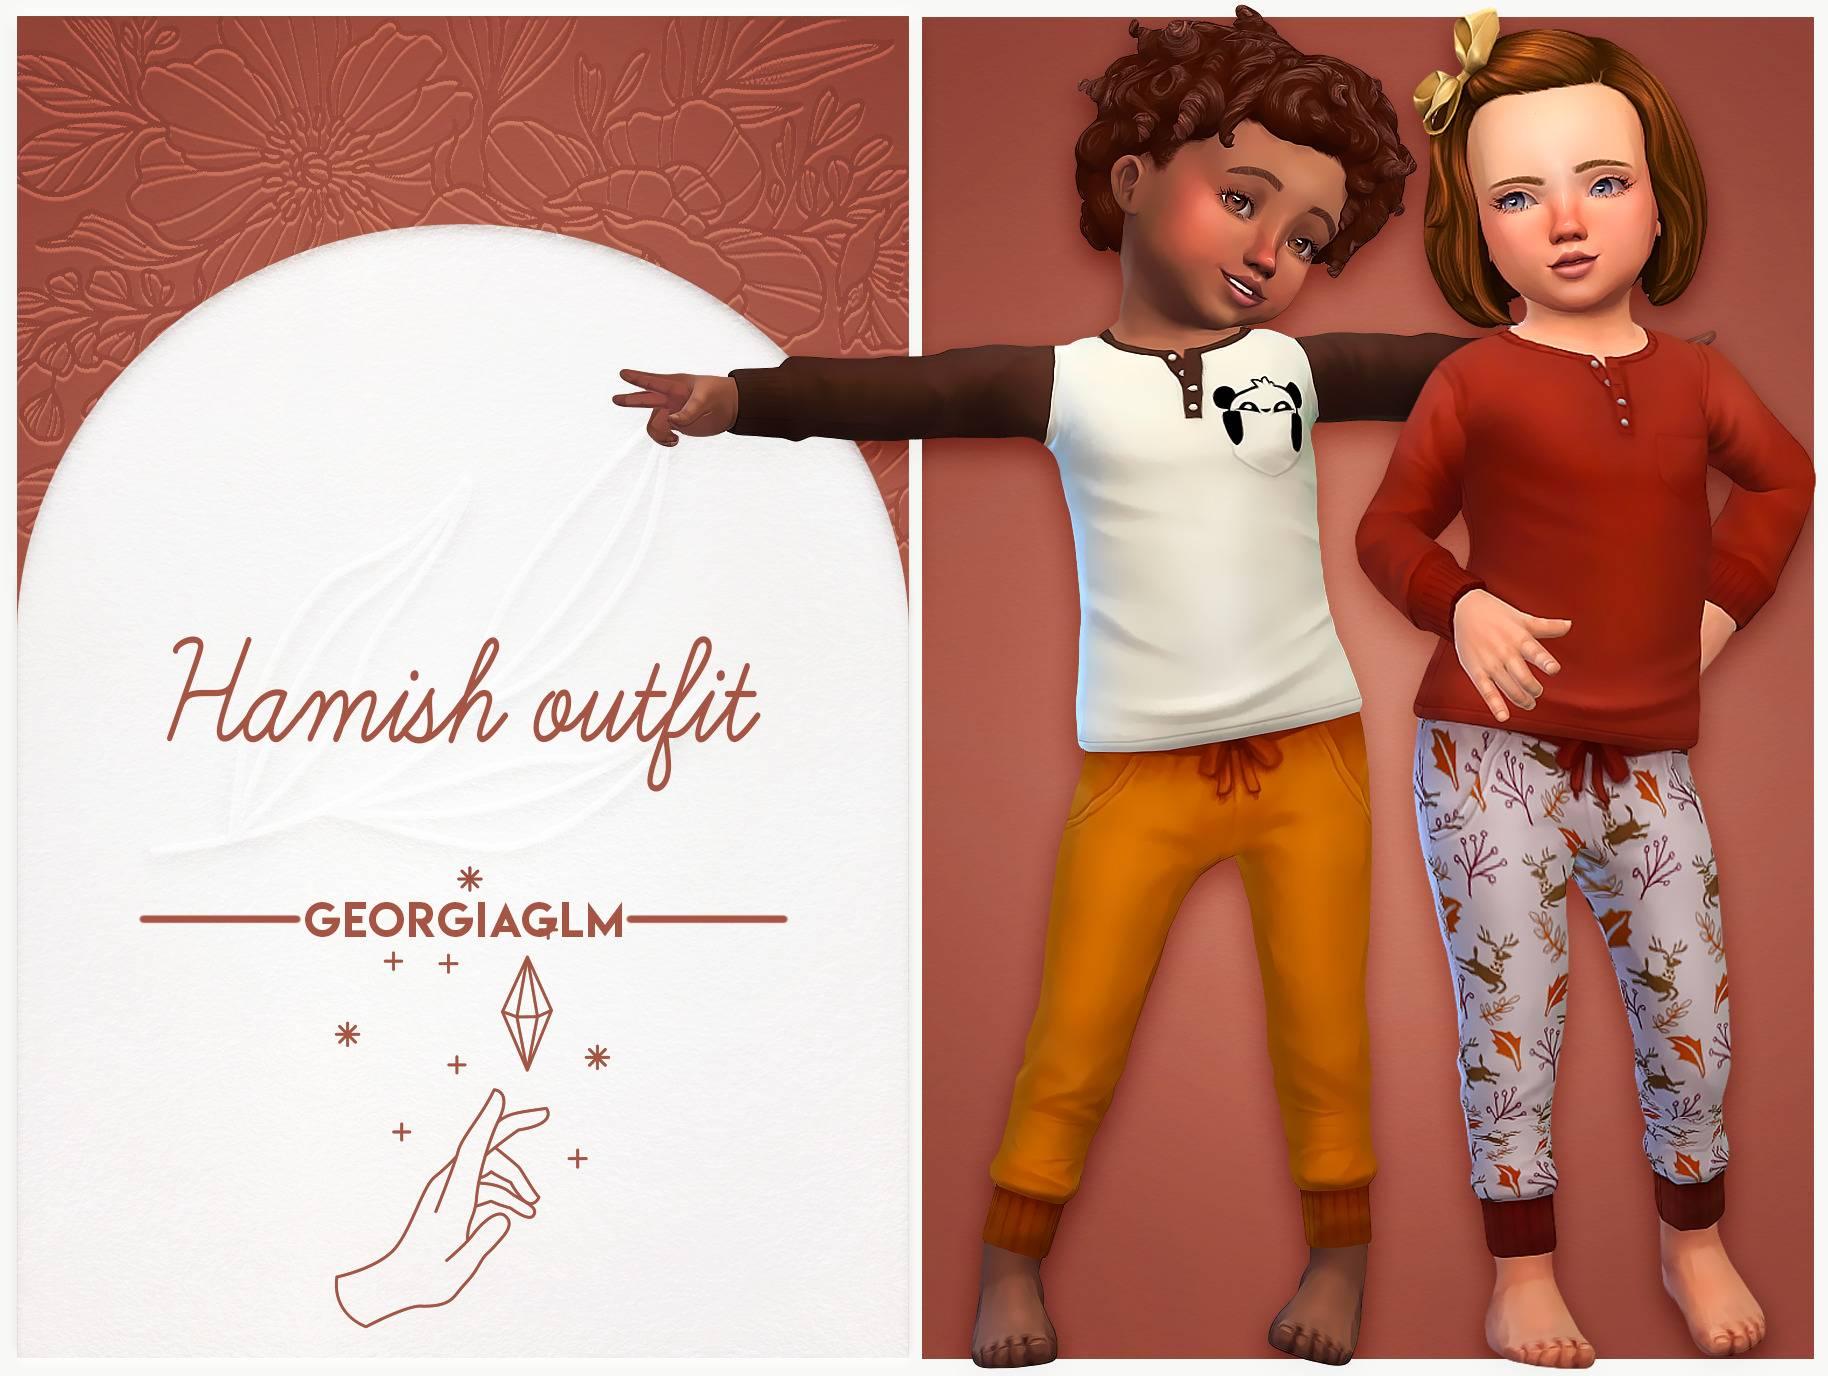 Джемпер и штаны - Hamish outfit